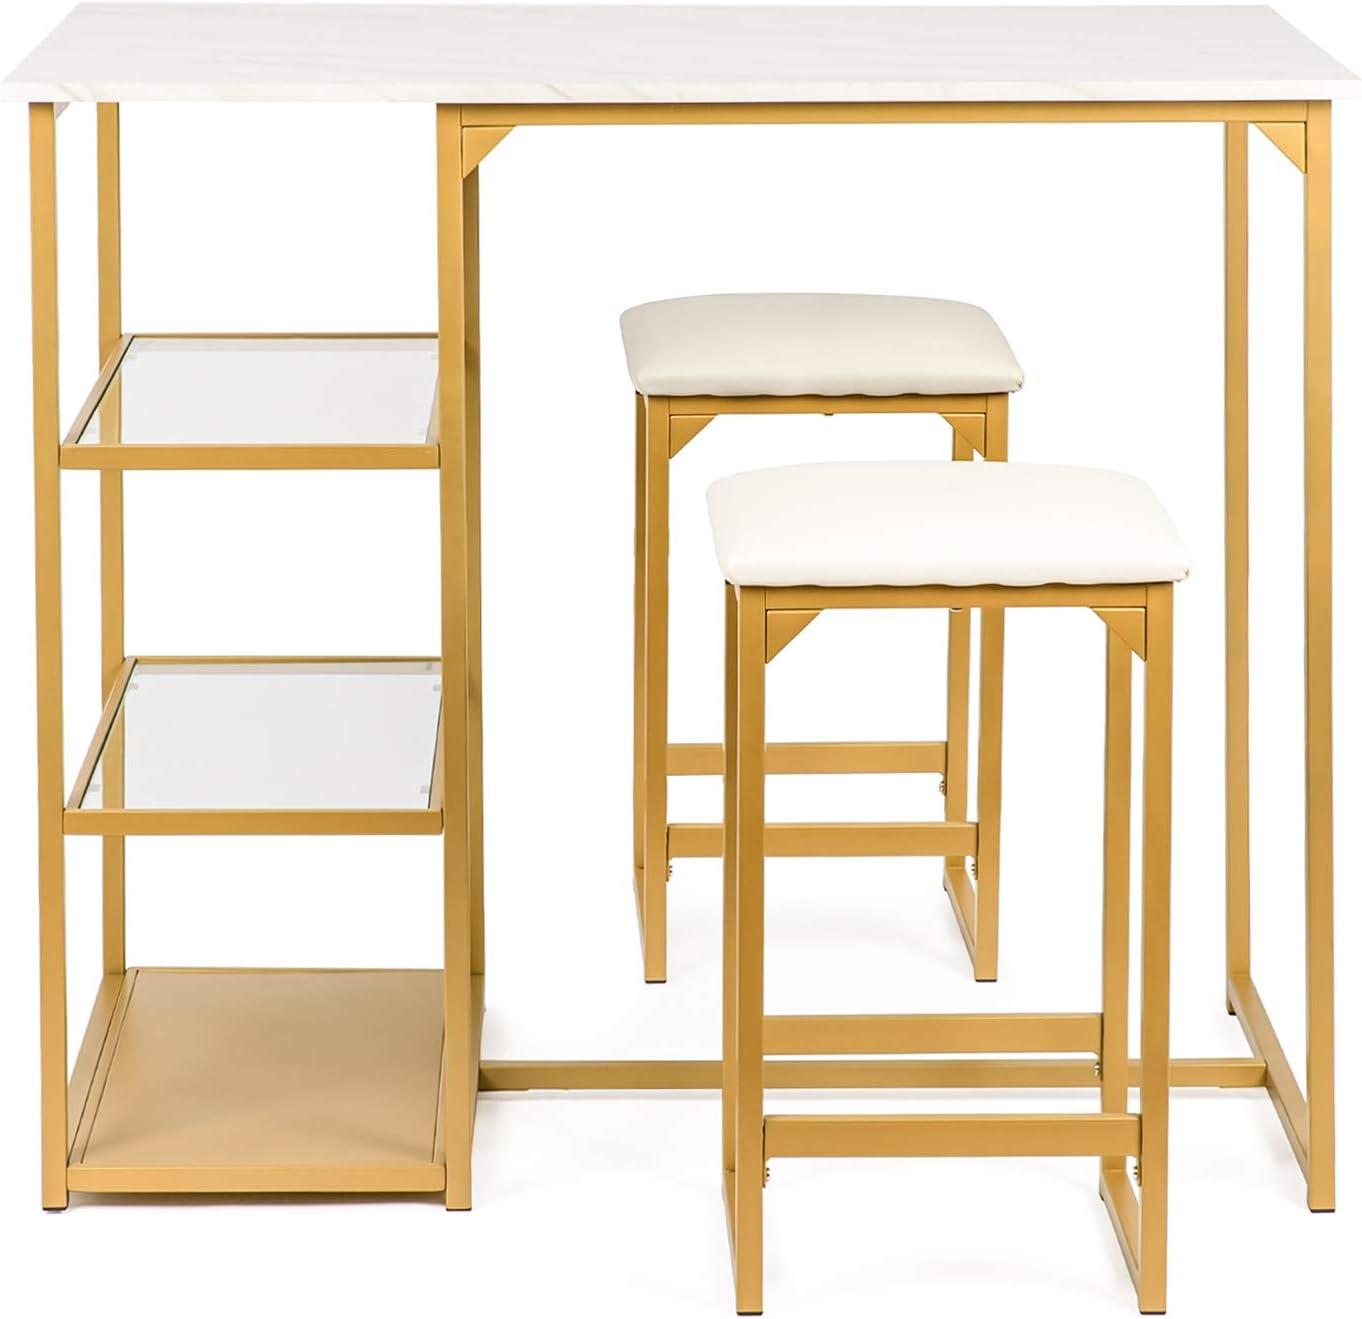 BAHOM 3 Piece Bar Table Set, Bistro Restaurant Dining Table Set with 2 Bar Stools for Home, Kitchen, Bar – Golden